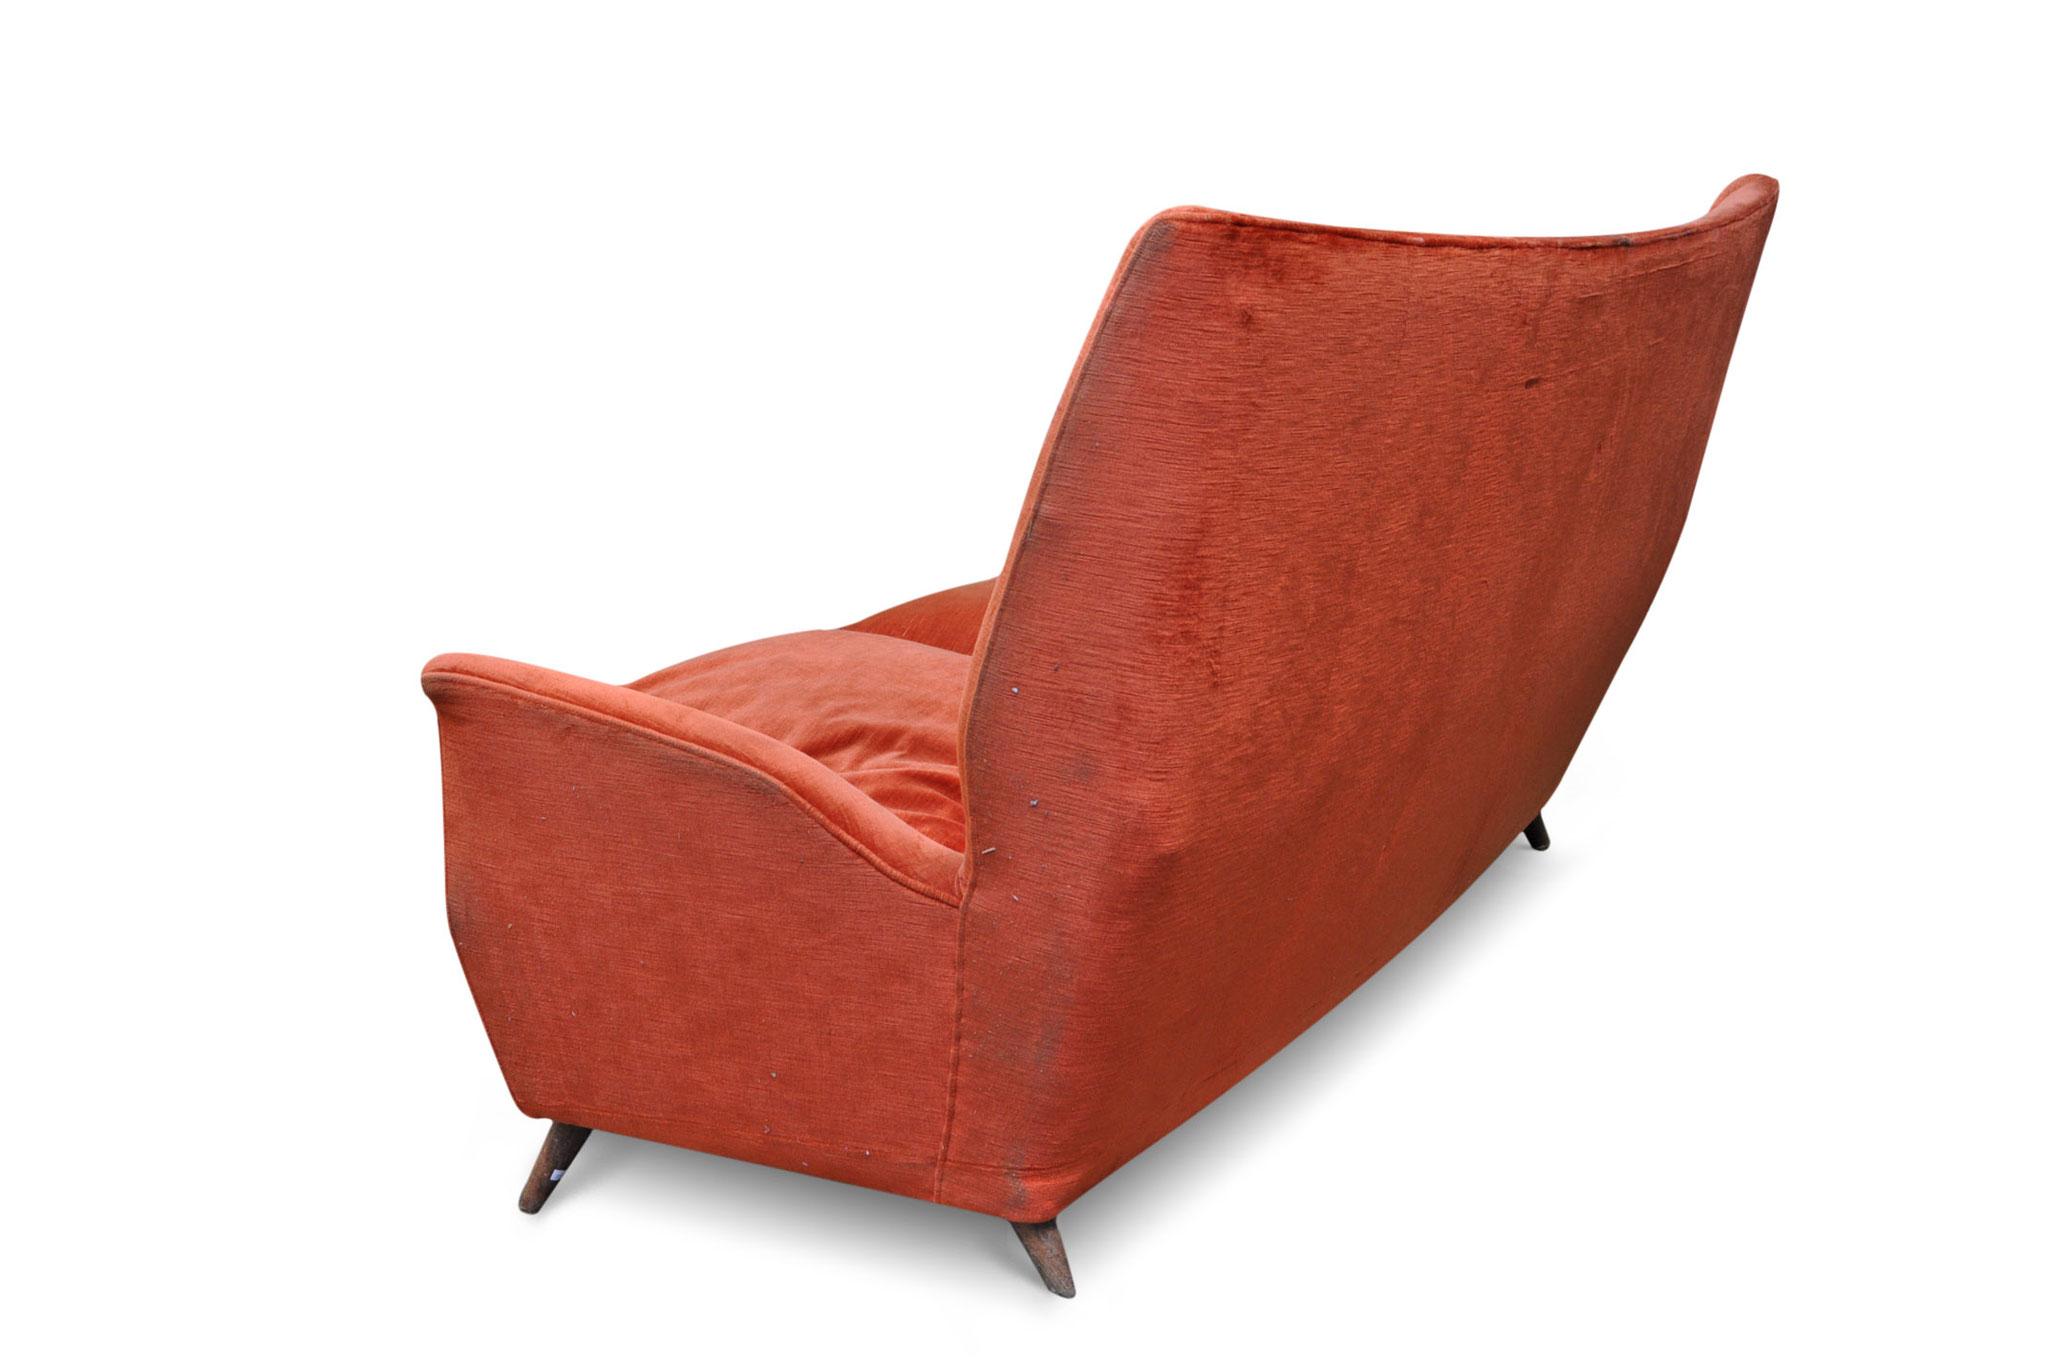 vintage sofa Gio Ponti